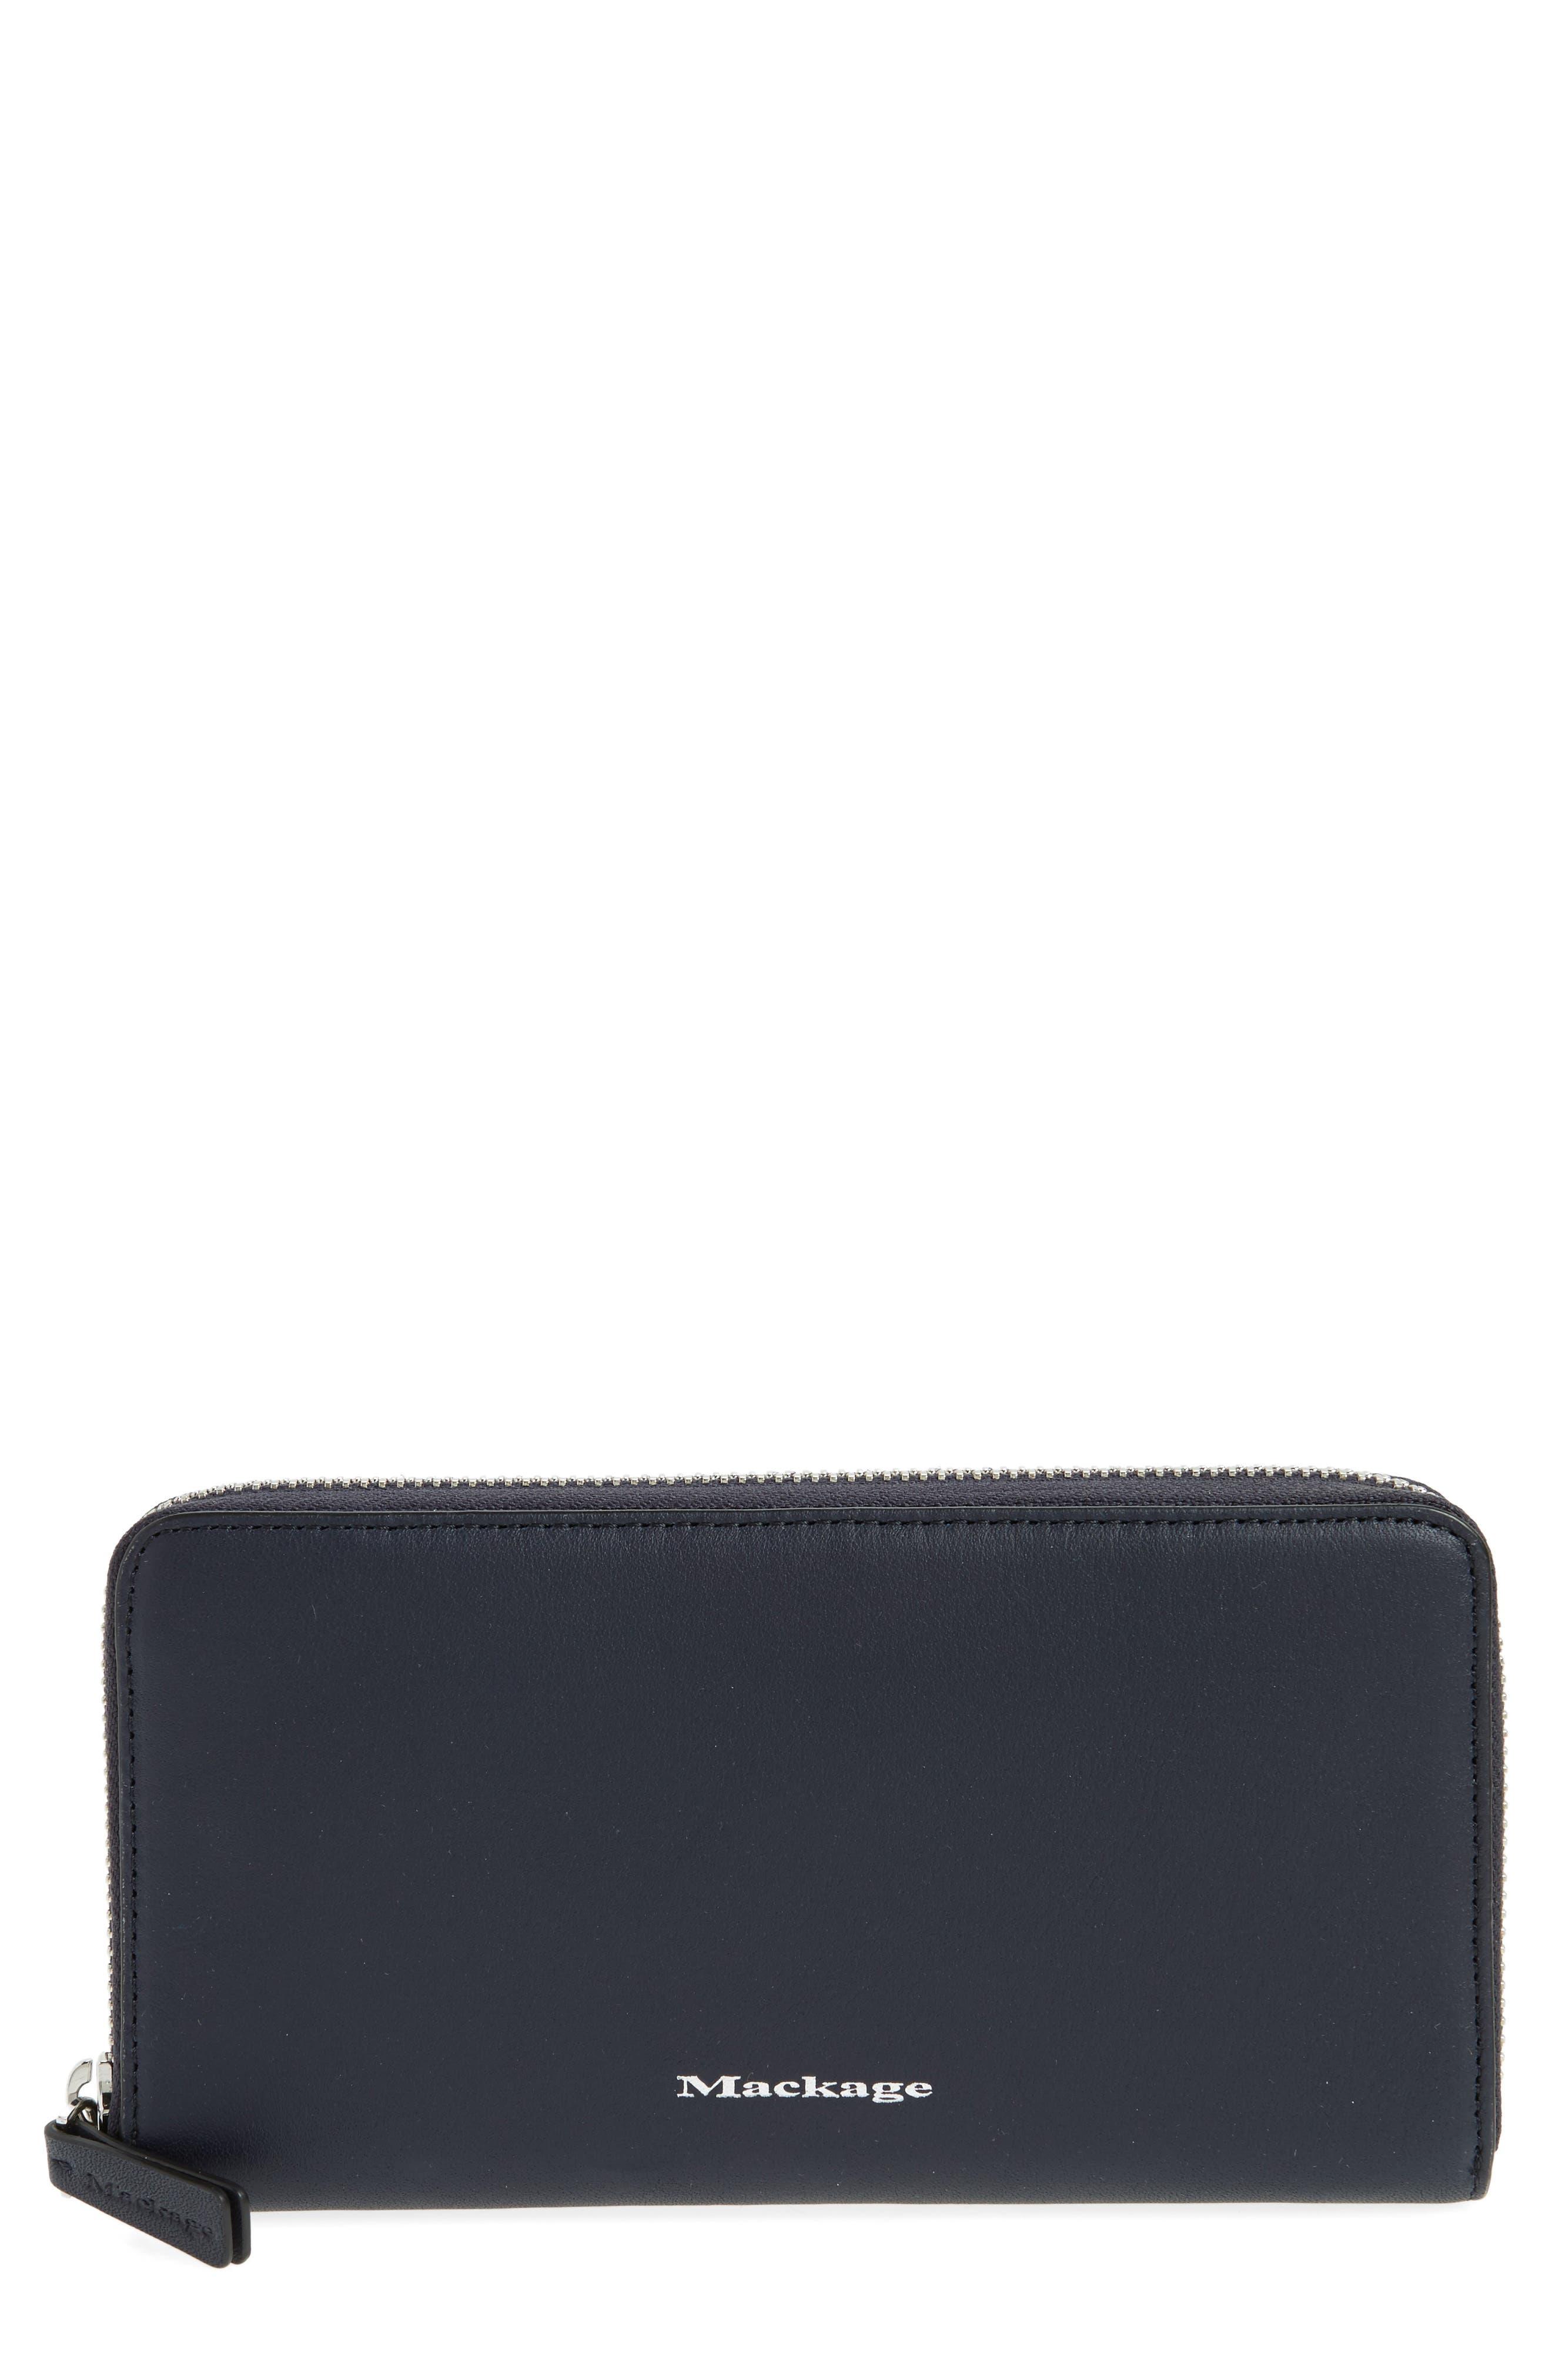 Alternate Image 1 Selected - Mackage Duke Zip Around Leather Wallet